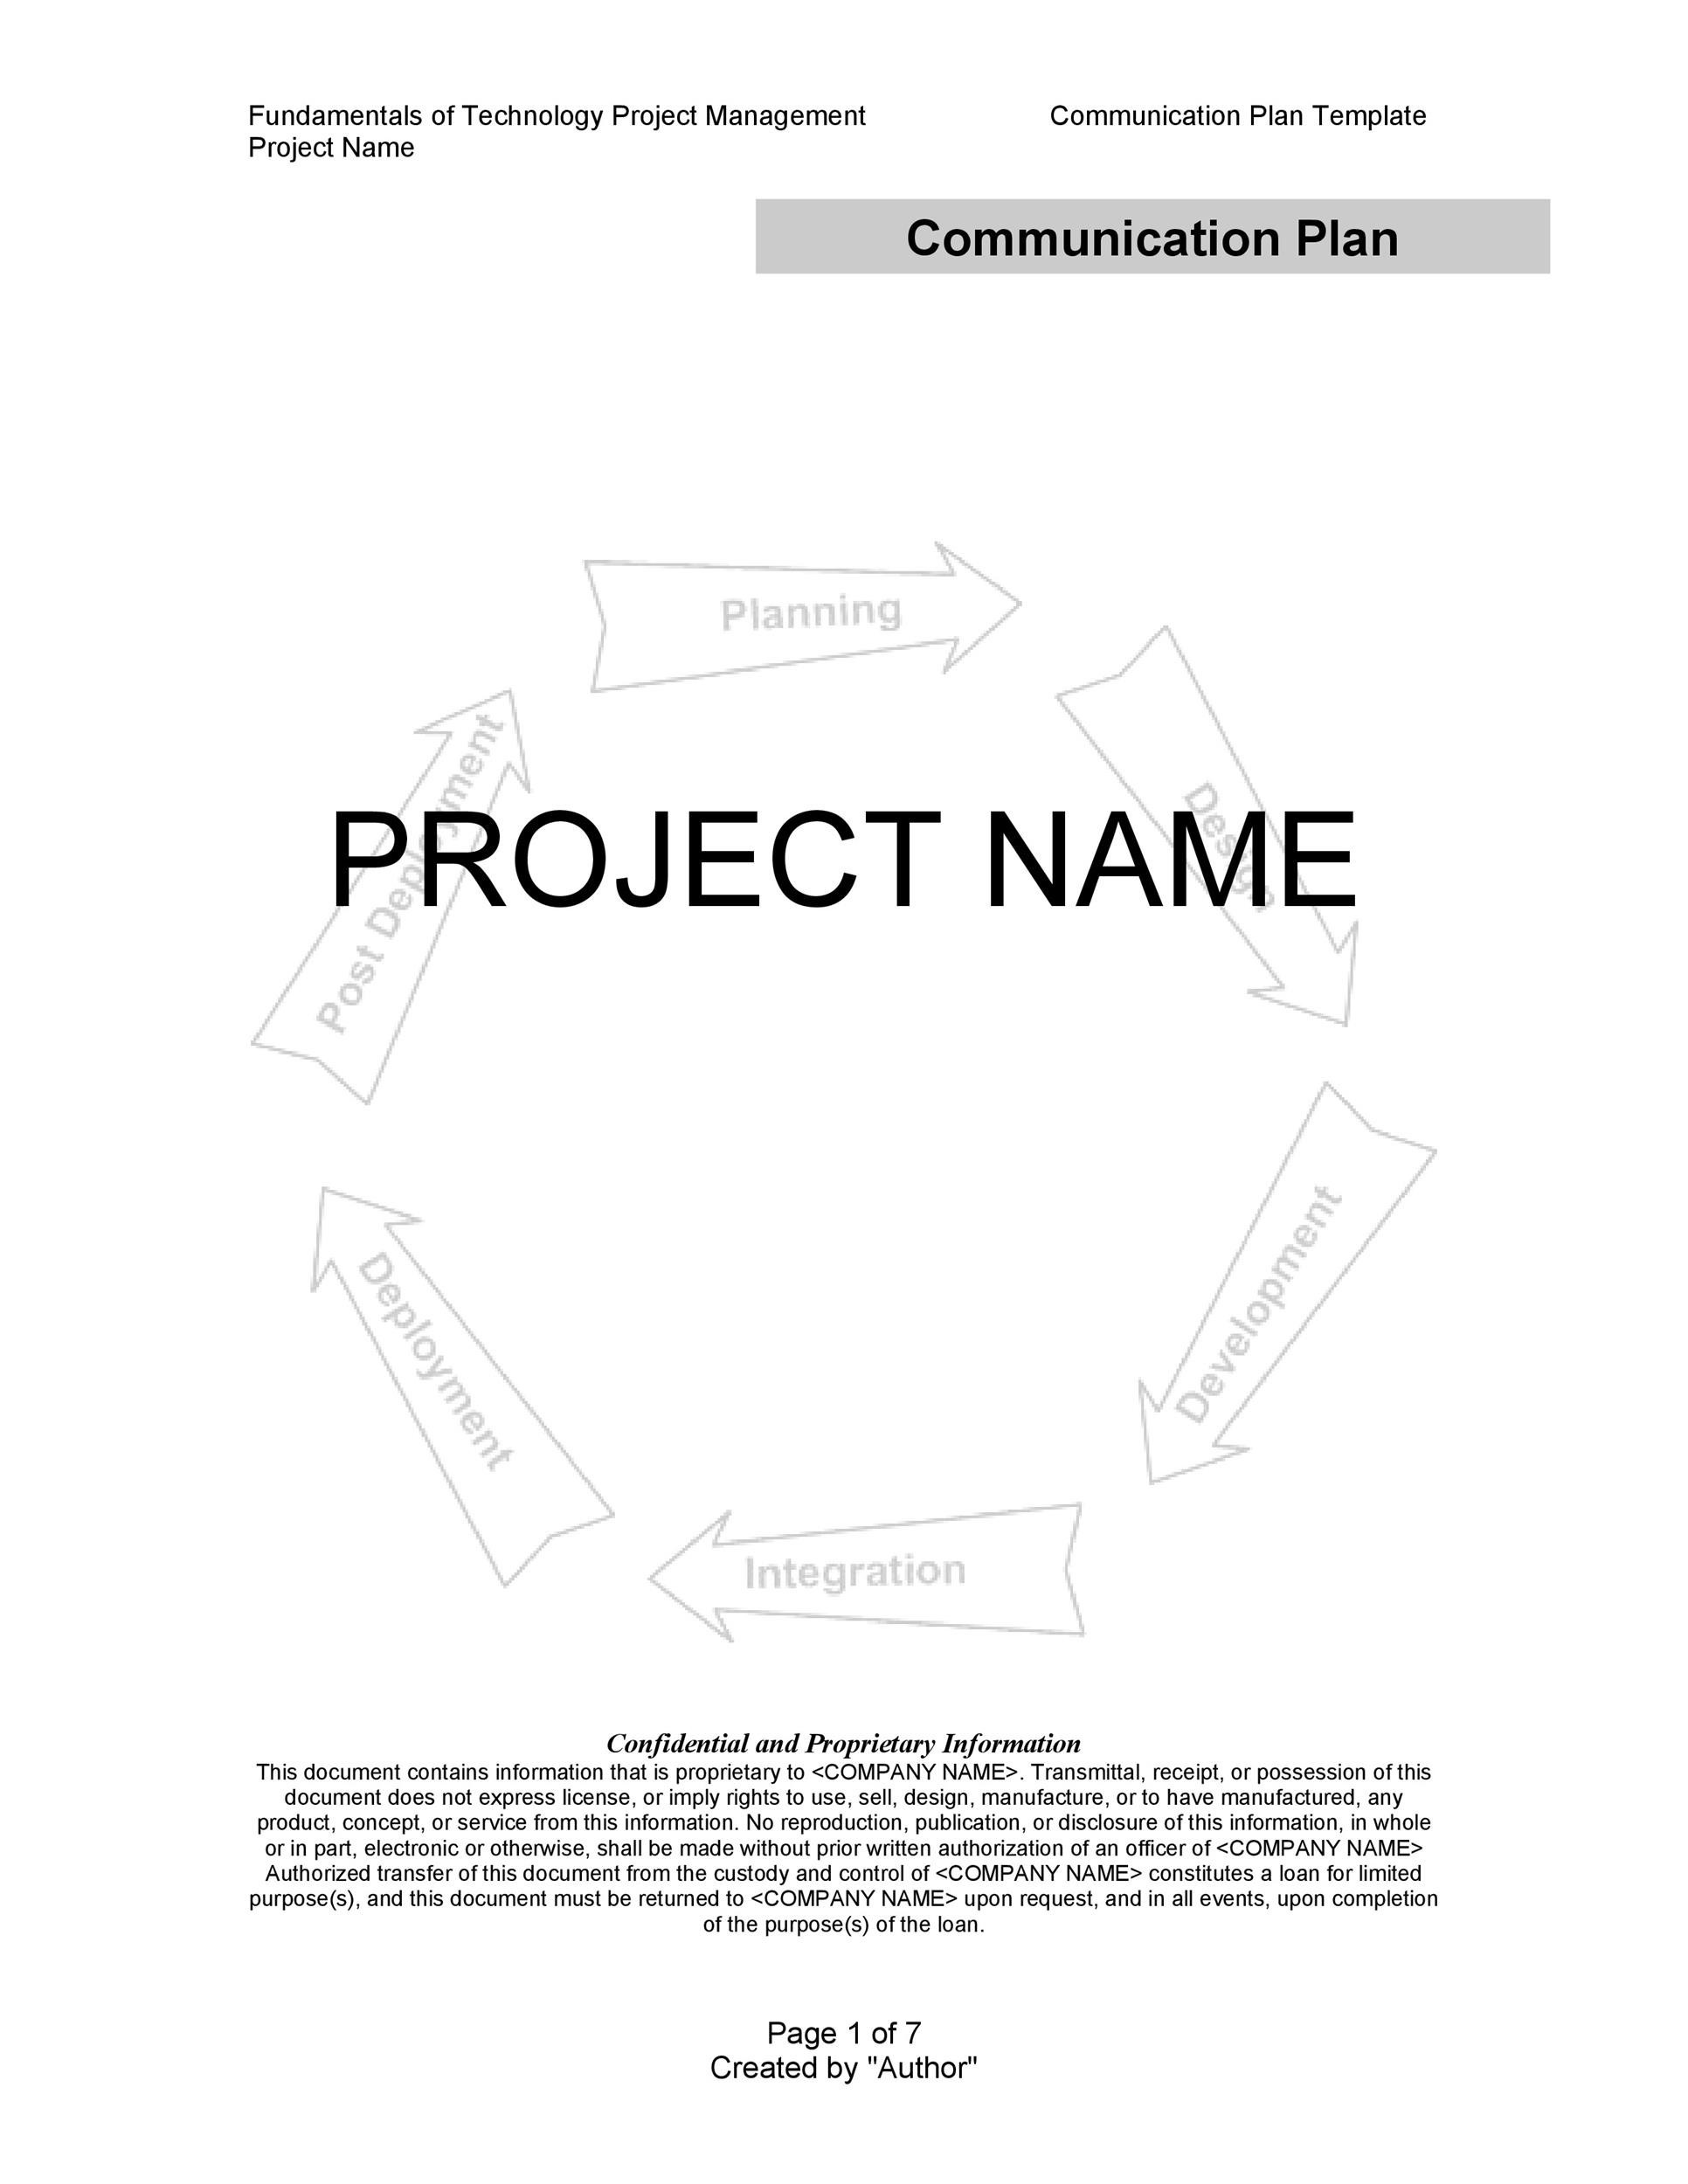 Free Communication Plan Template 06